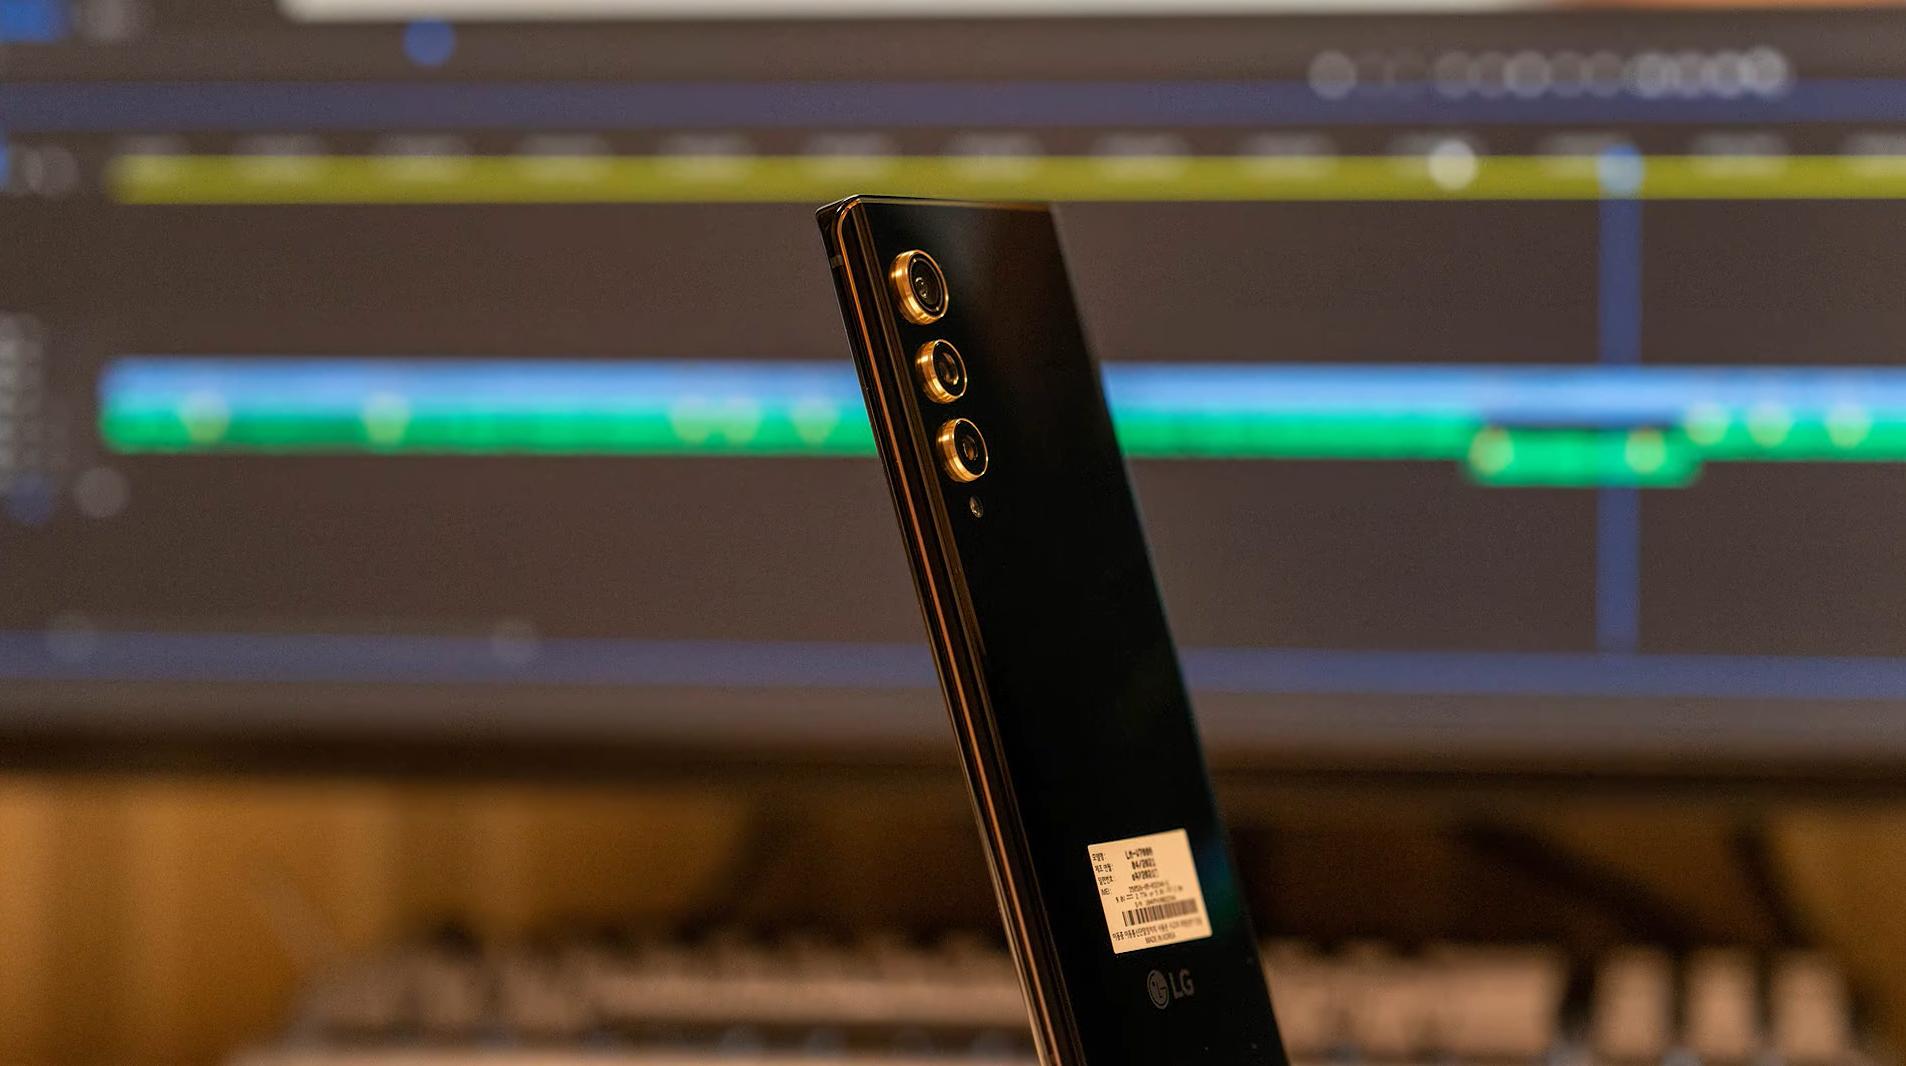 Así habría sido el próximo móvil LG: Velvet 2 Pro en vídeo